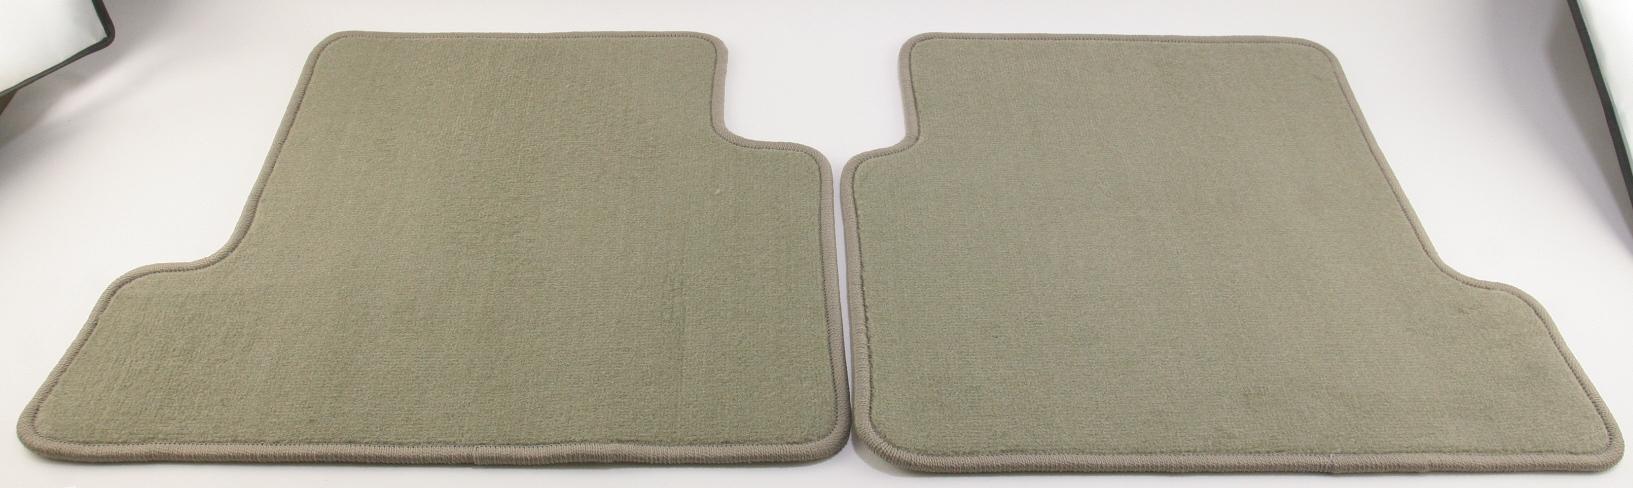 ***~ New OEM Ford CJ5Z7813106AA 13-16 Escape Carpet Rear Mats Medium Light Stone - image 1